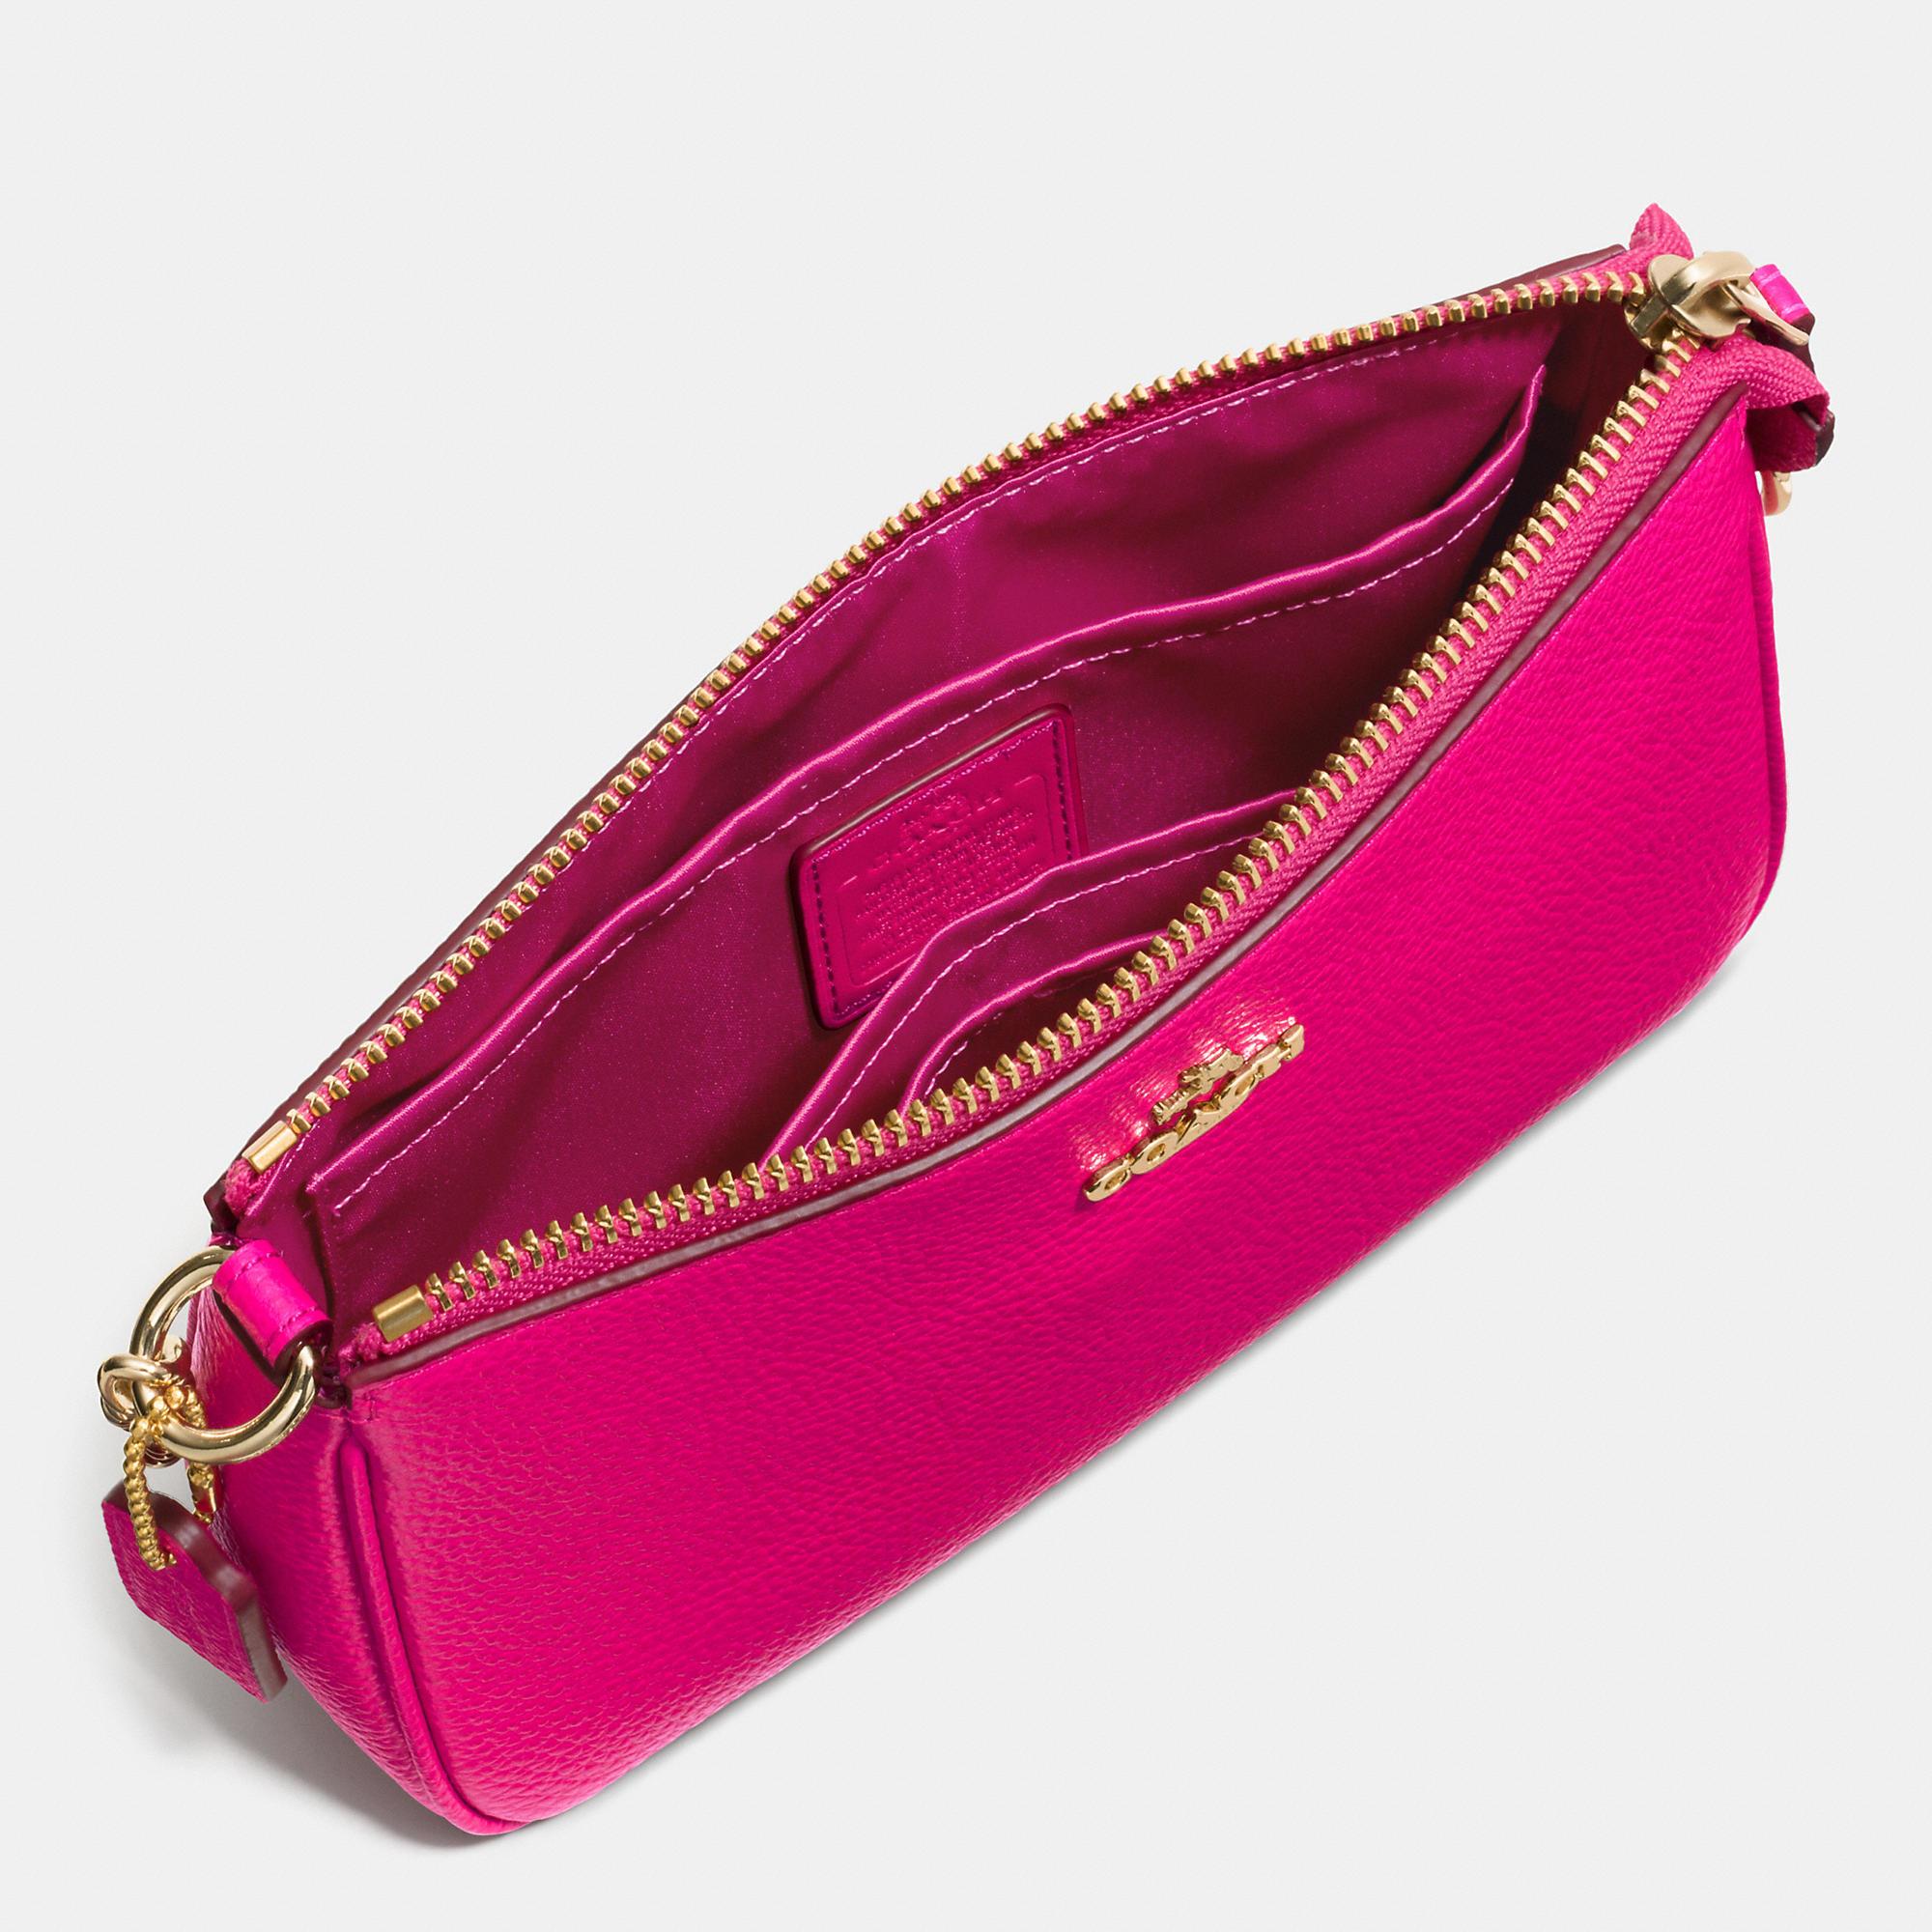 coach wristlets handbags australia cheap coachonline